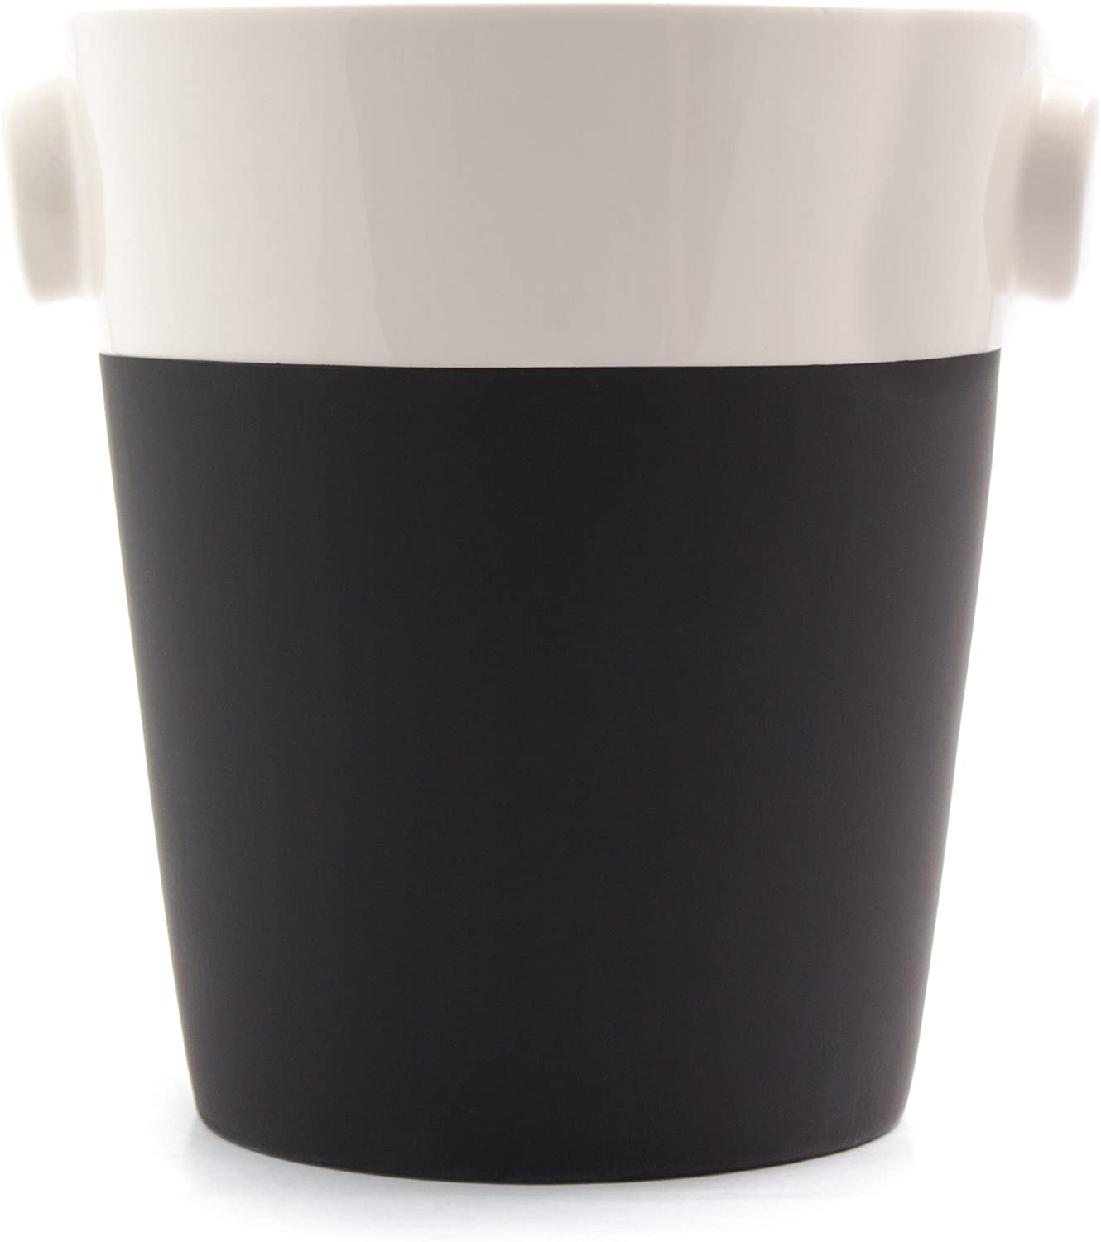 Magisso(マギソ) シャンパンクーラー ホワイトライン 70636の商品画像2